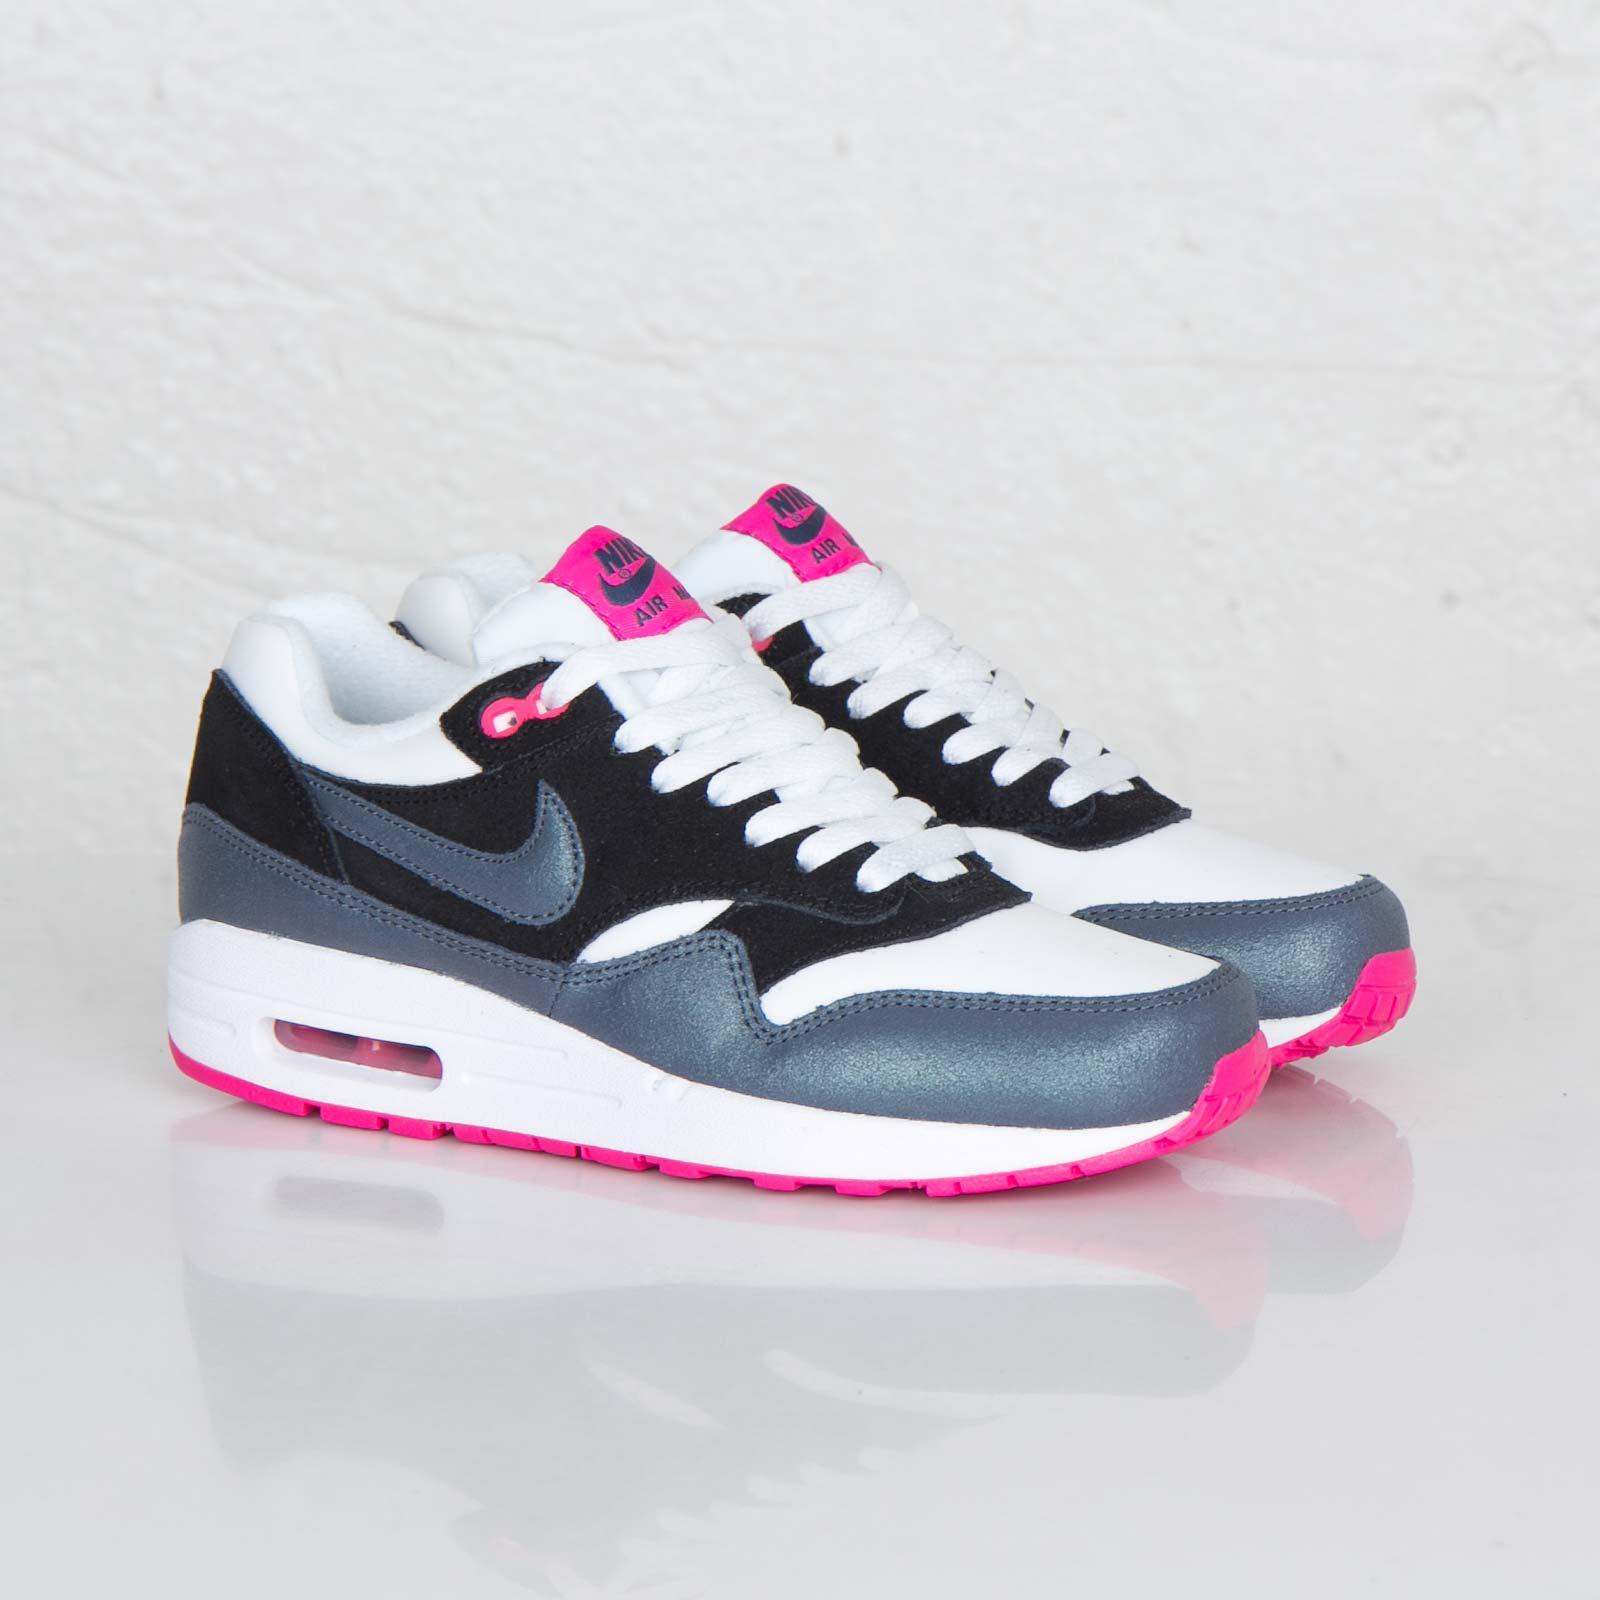 Nike Wmns Air Max 1 Essential 599820 102 Sneakersnstuff